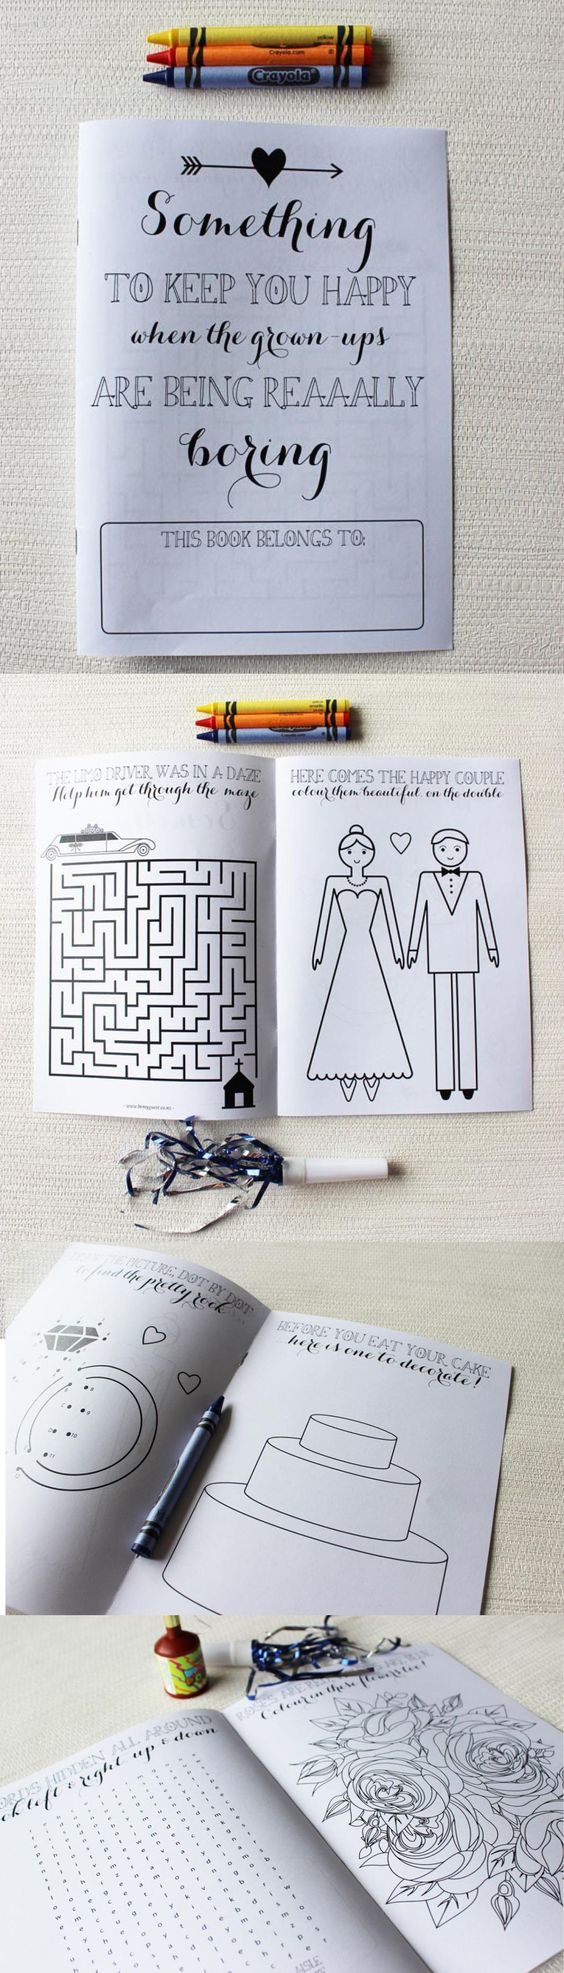 wedding activity books for the wedding speeches